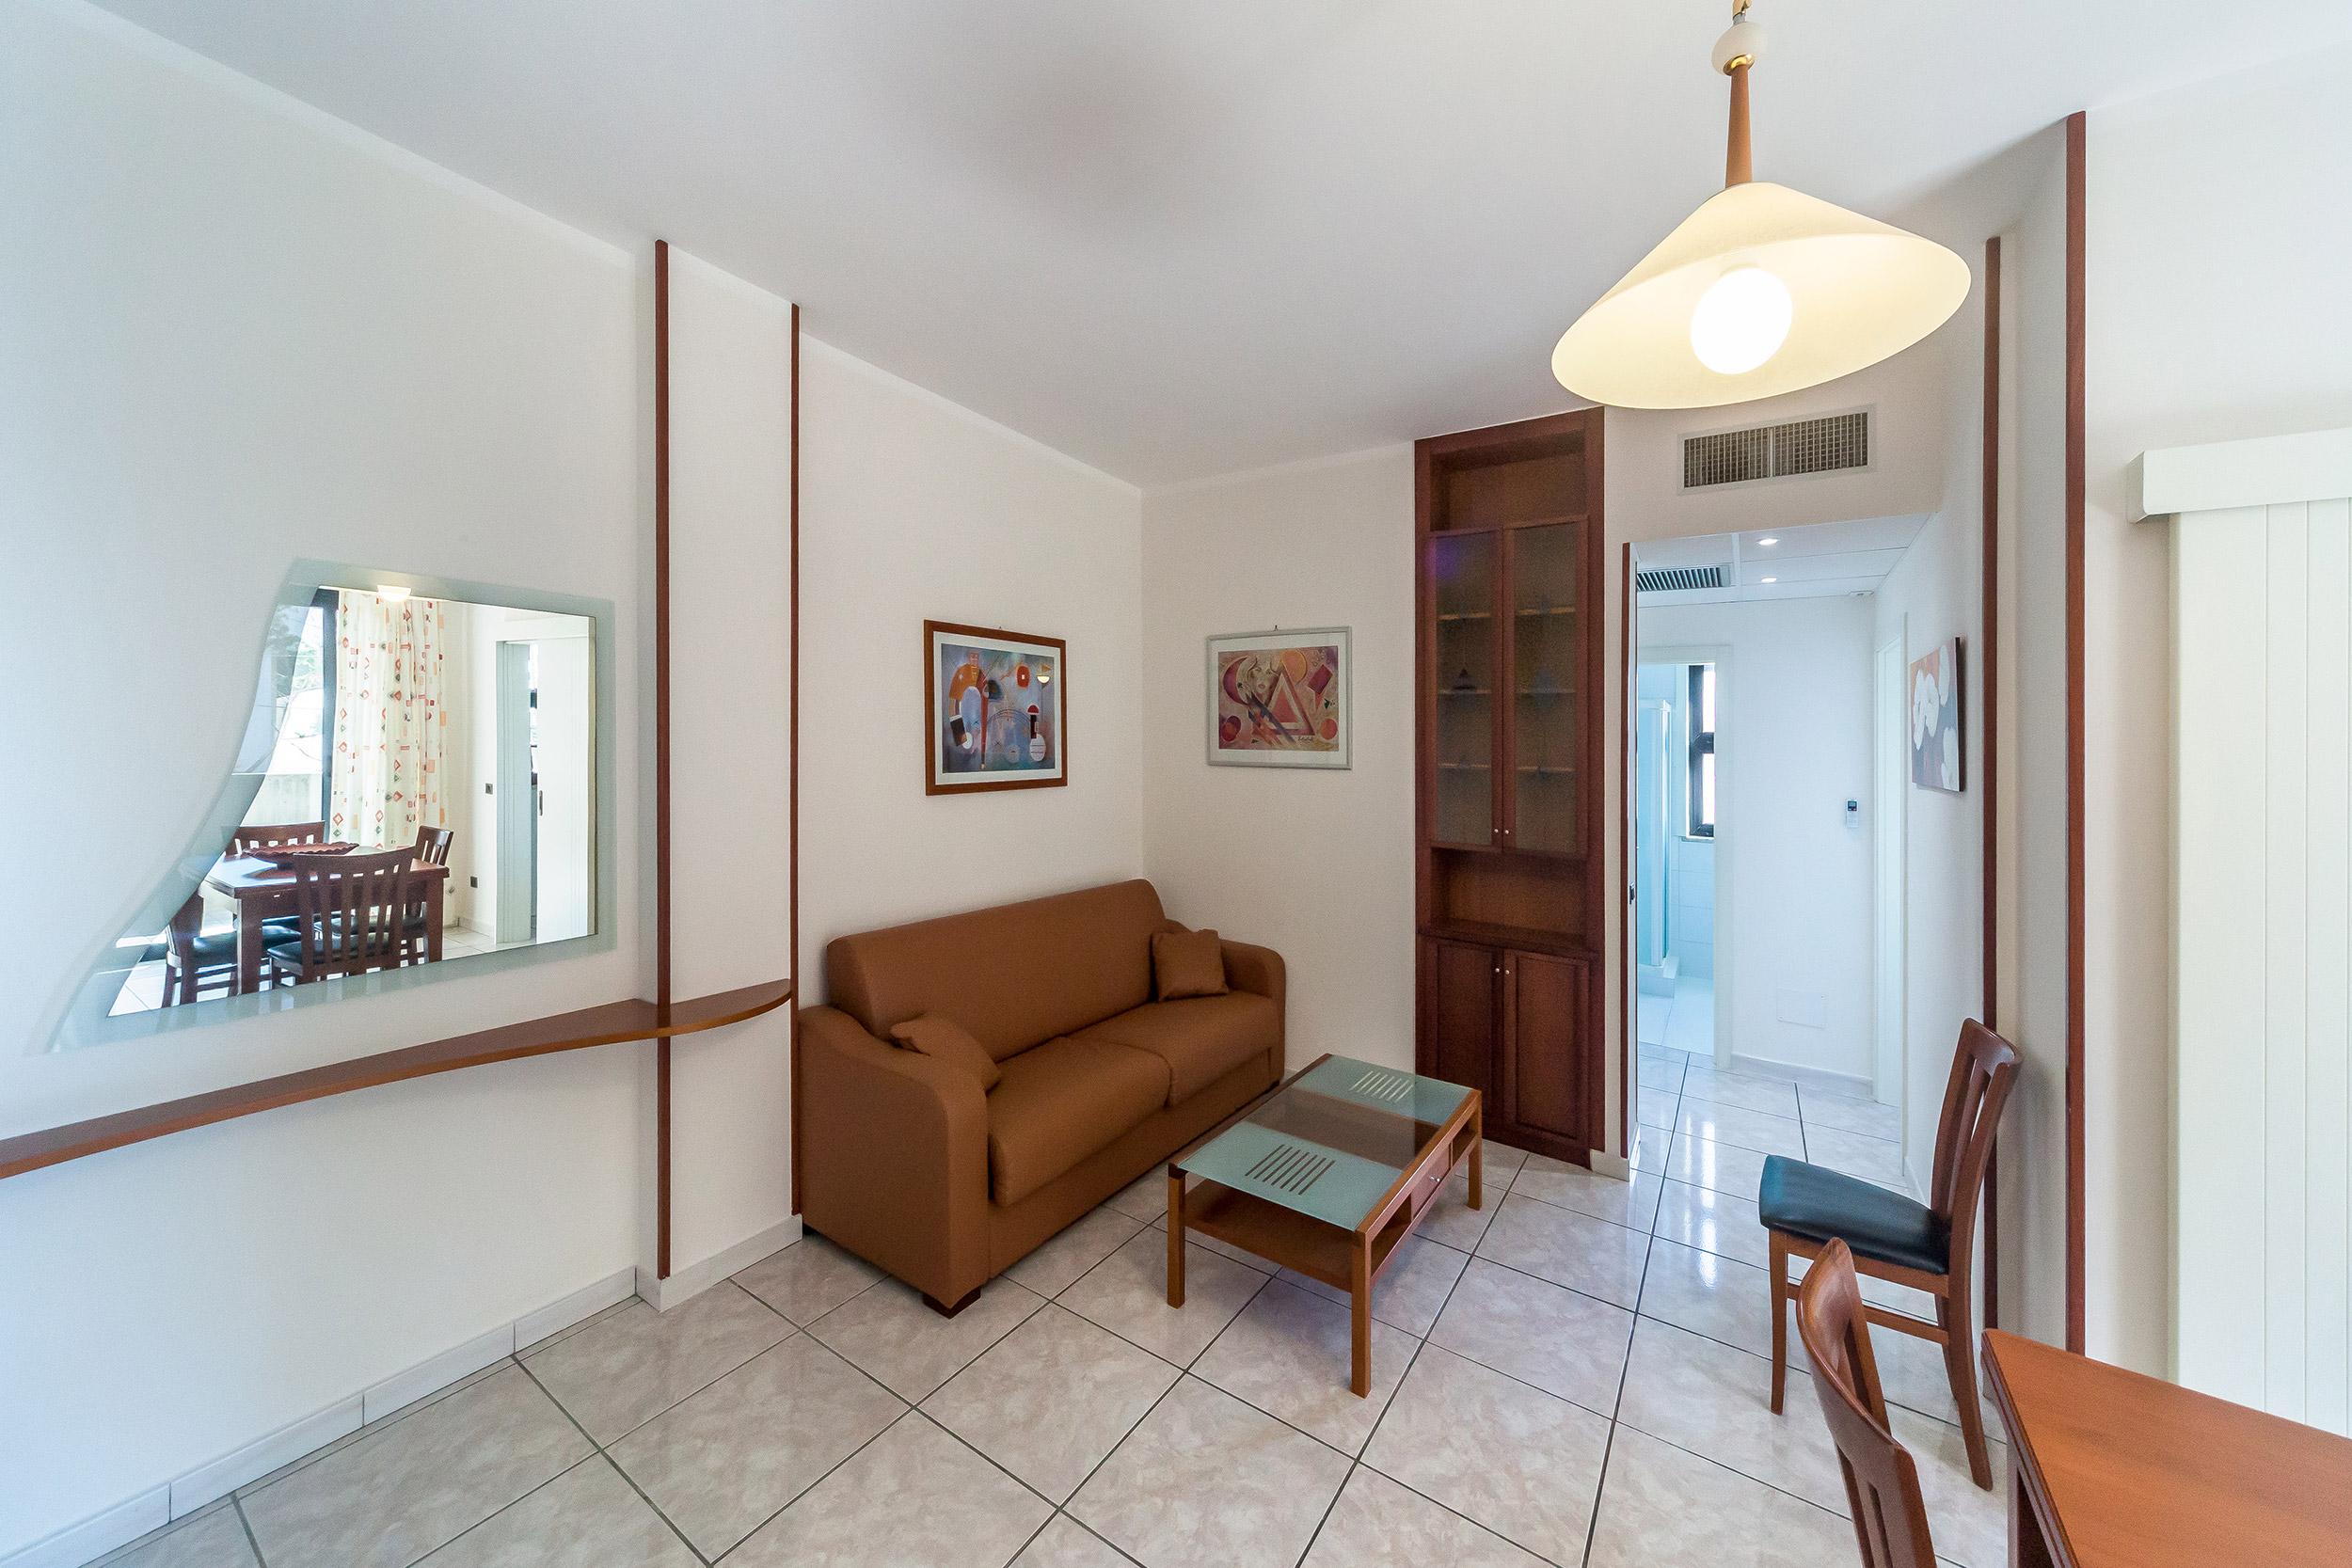 Ferienwohnung Appartamento vista mare a Gallipoli 4/6 posti - Baia Blu Side (2574458), Gallipoli, Lecce, Apulien, Italien, Bild 7